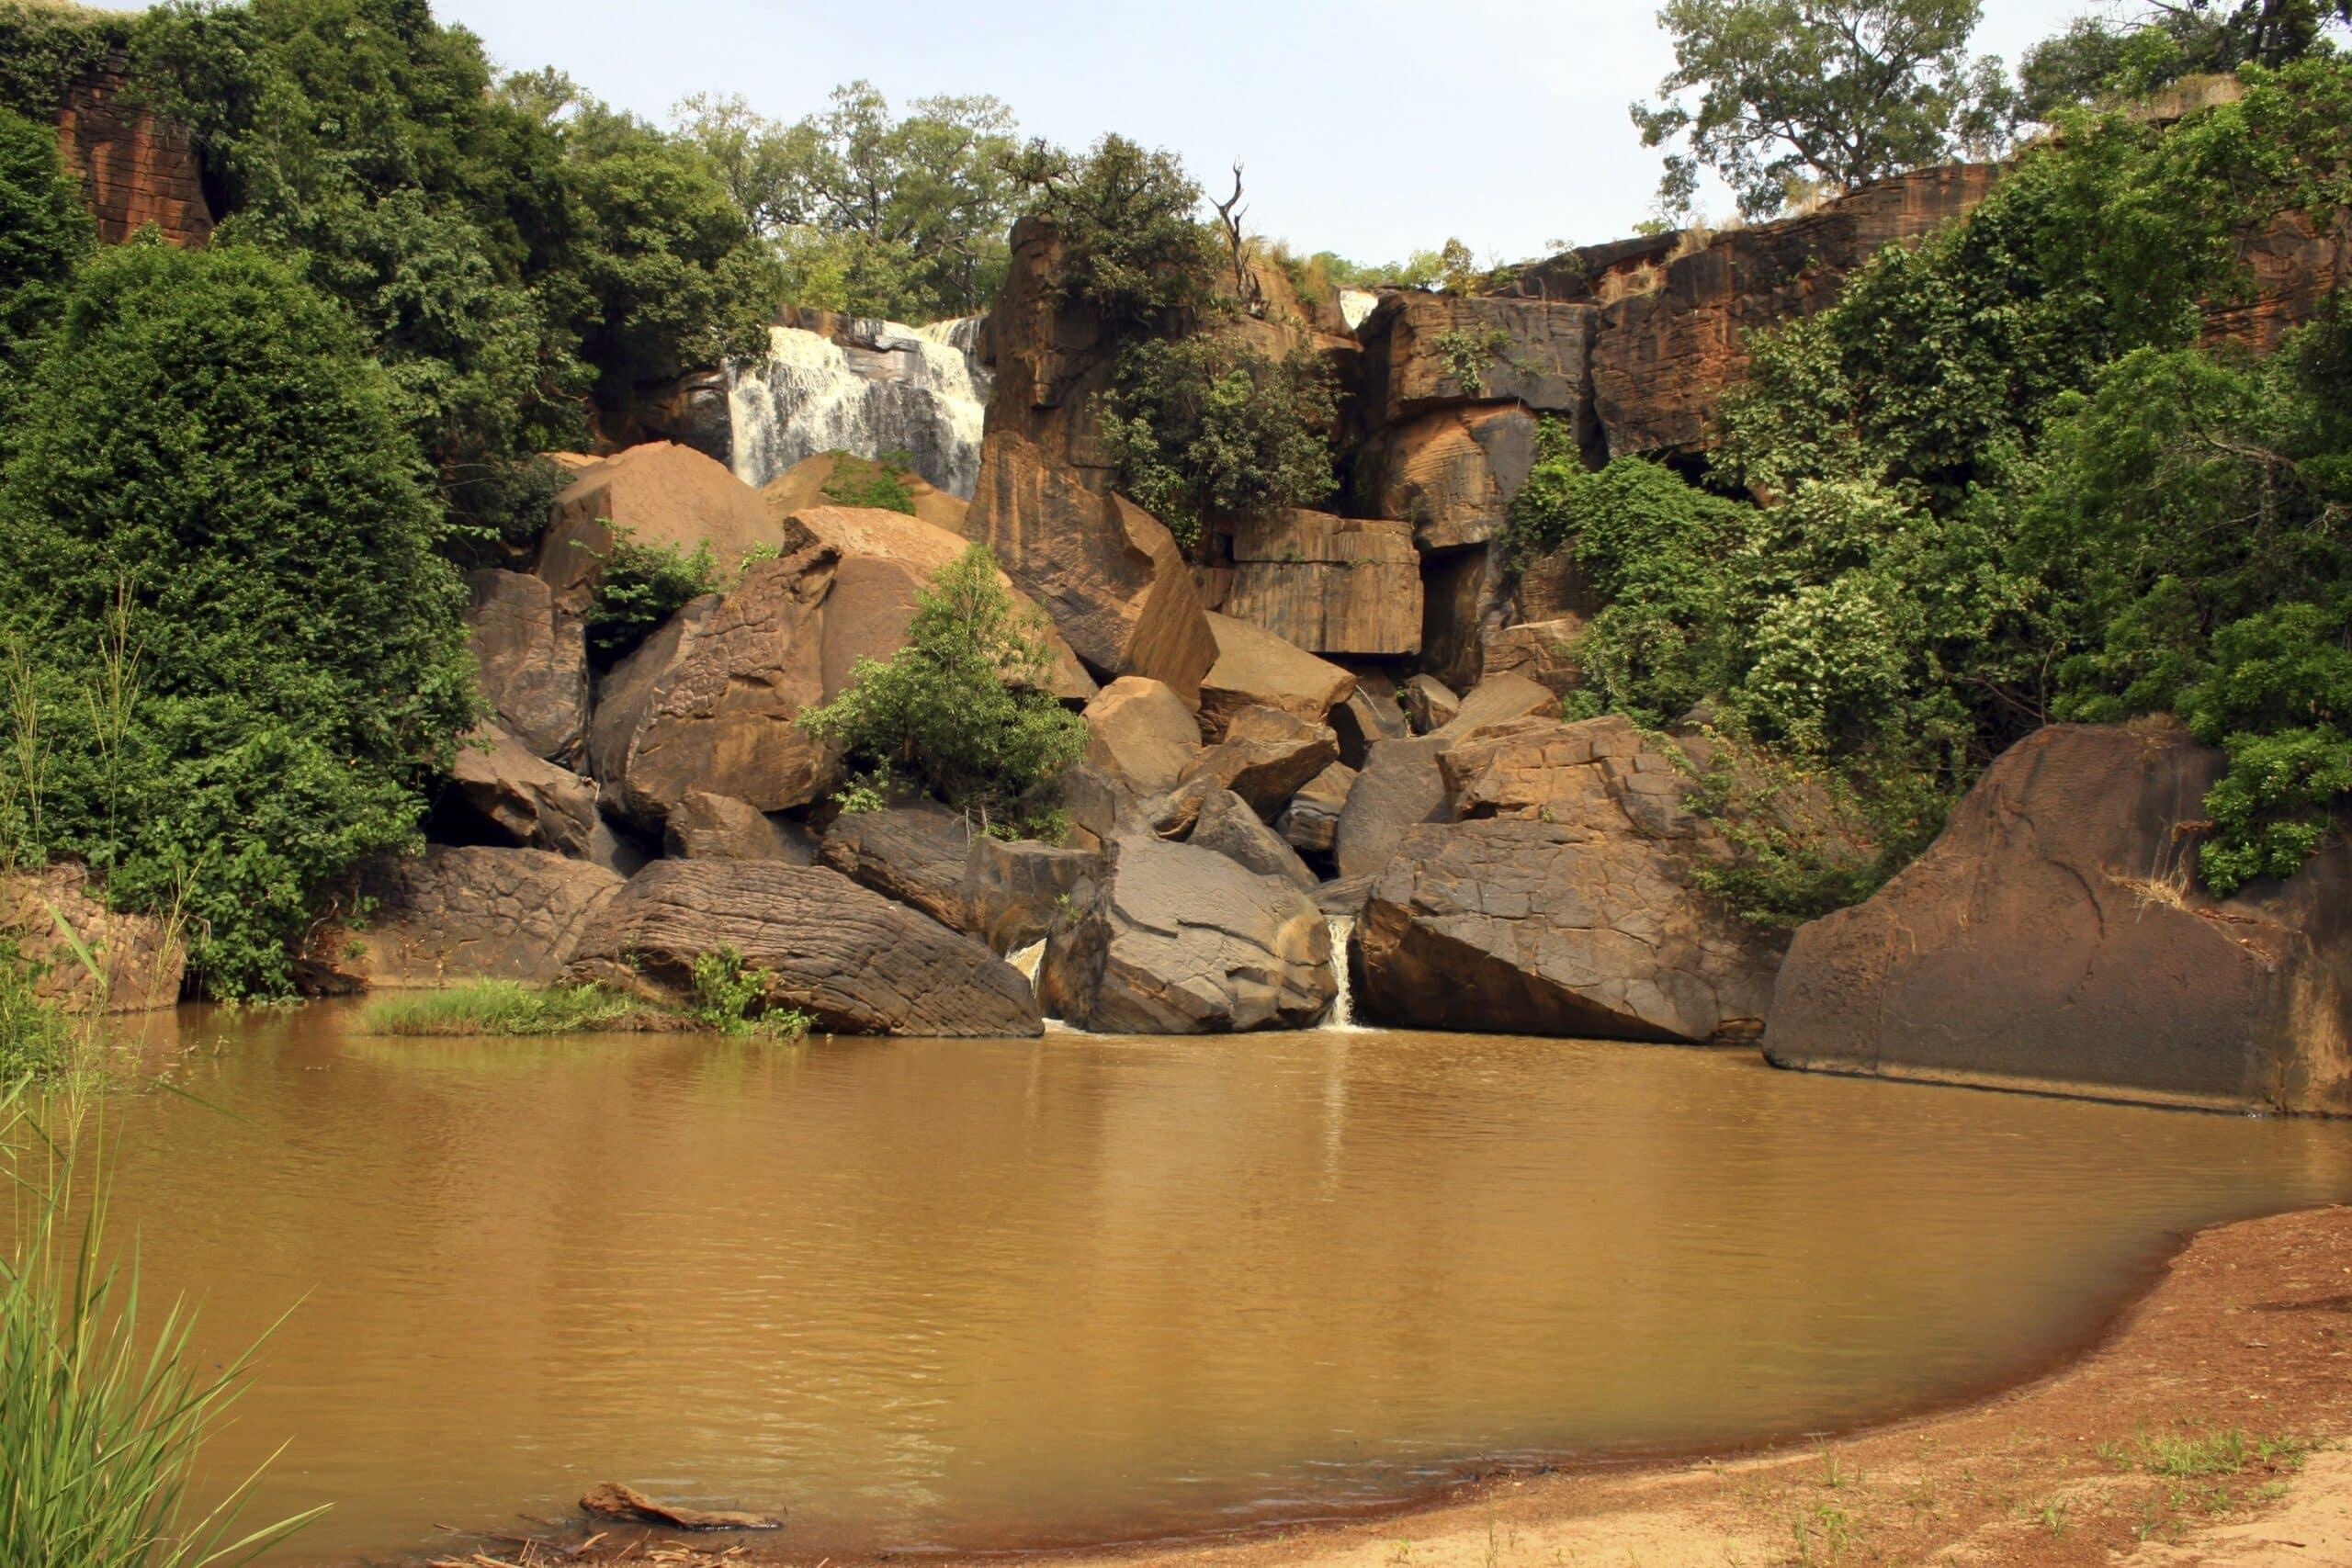 Burkina Faso Reise - Reisebericht